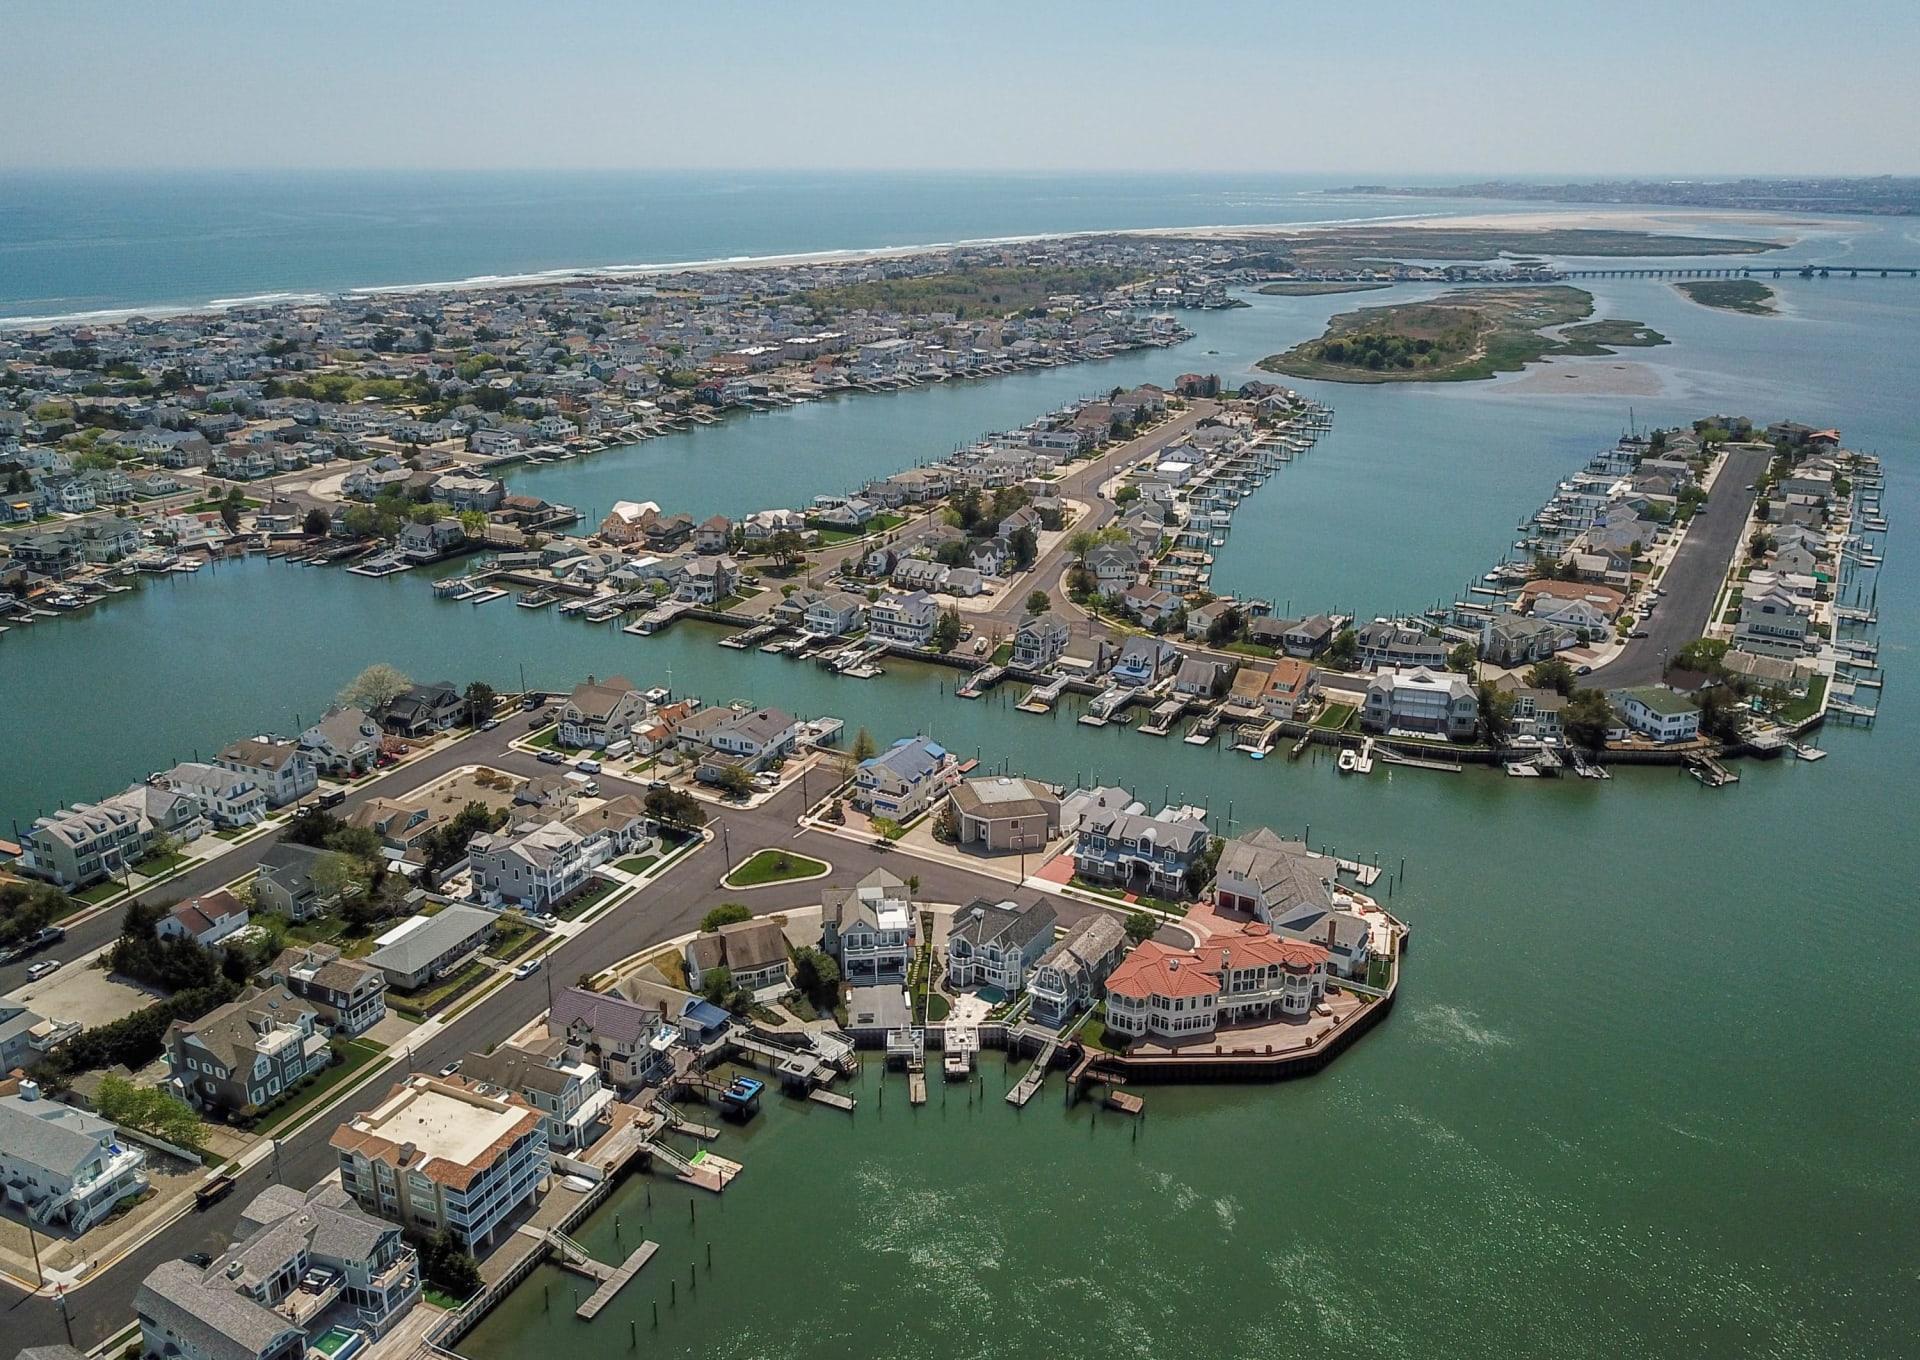 Stone Harbor image